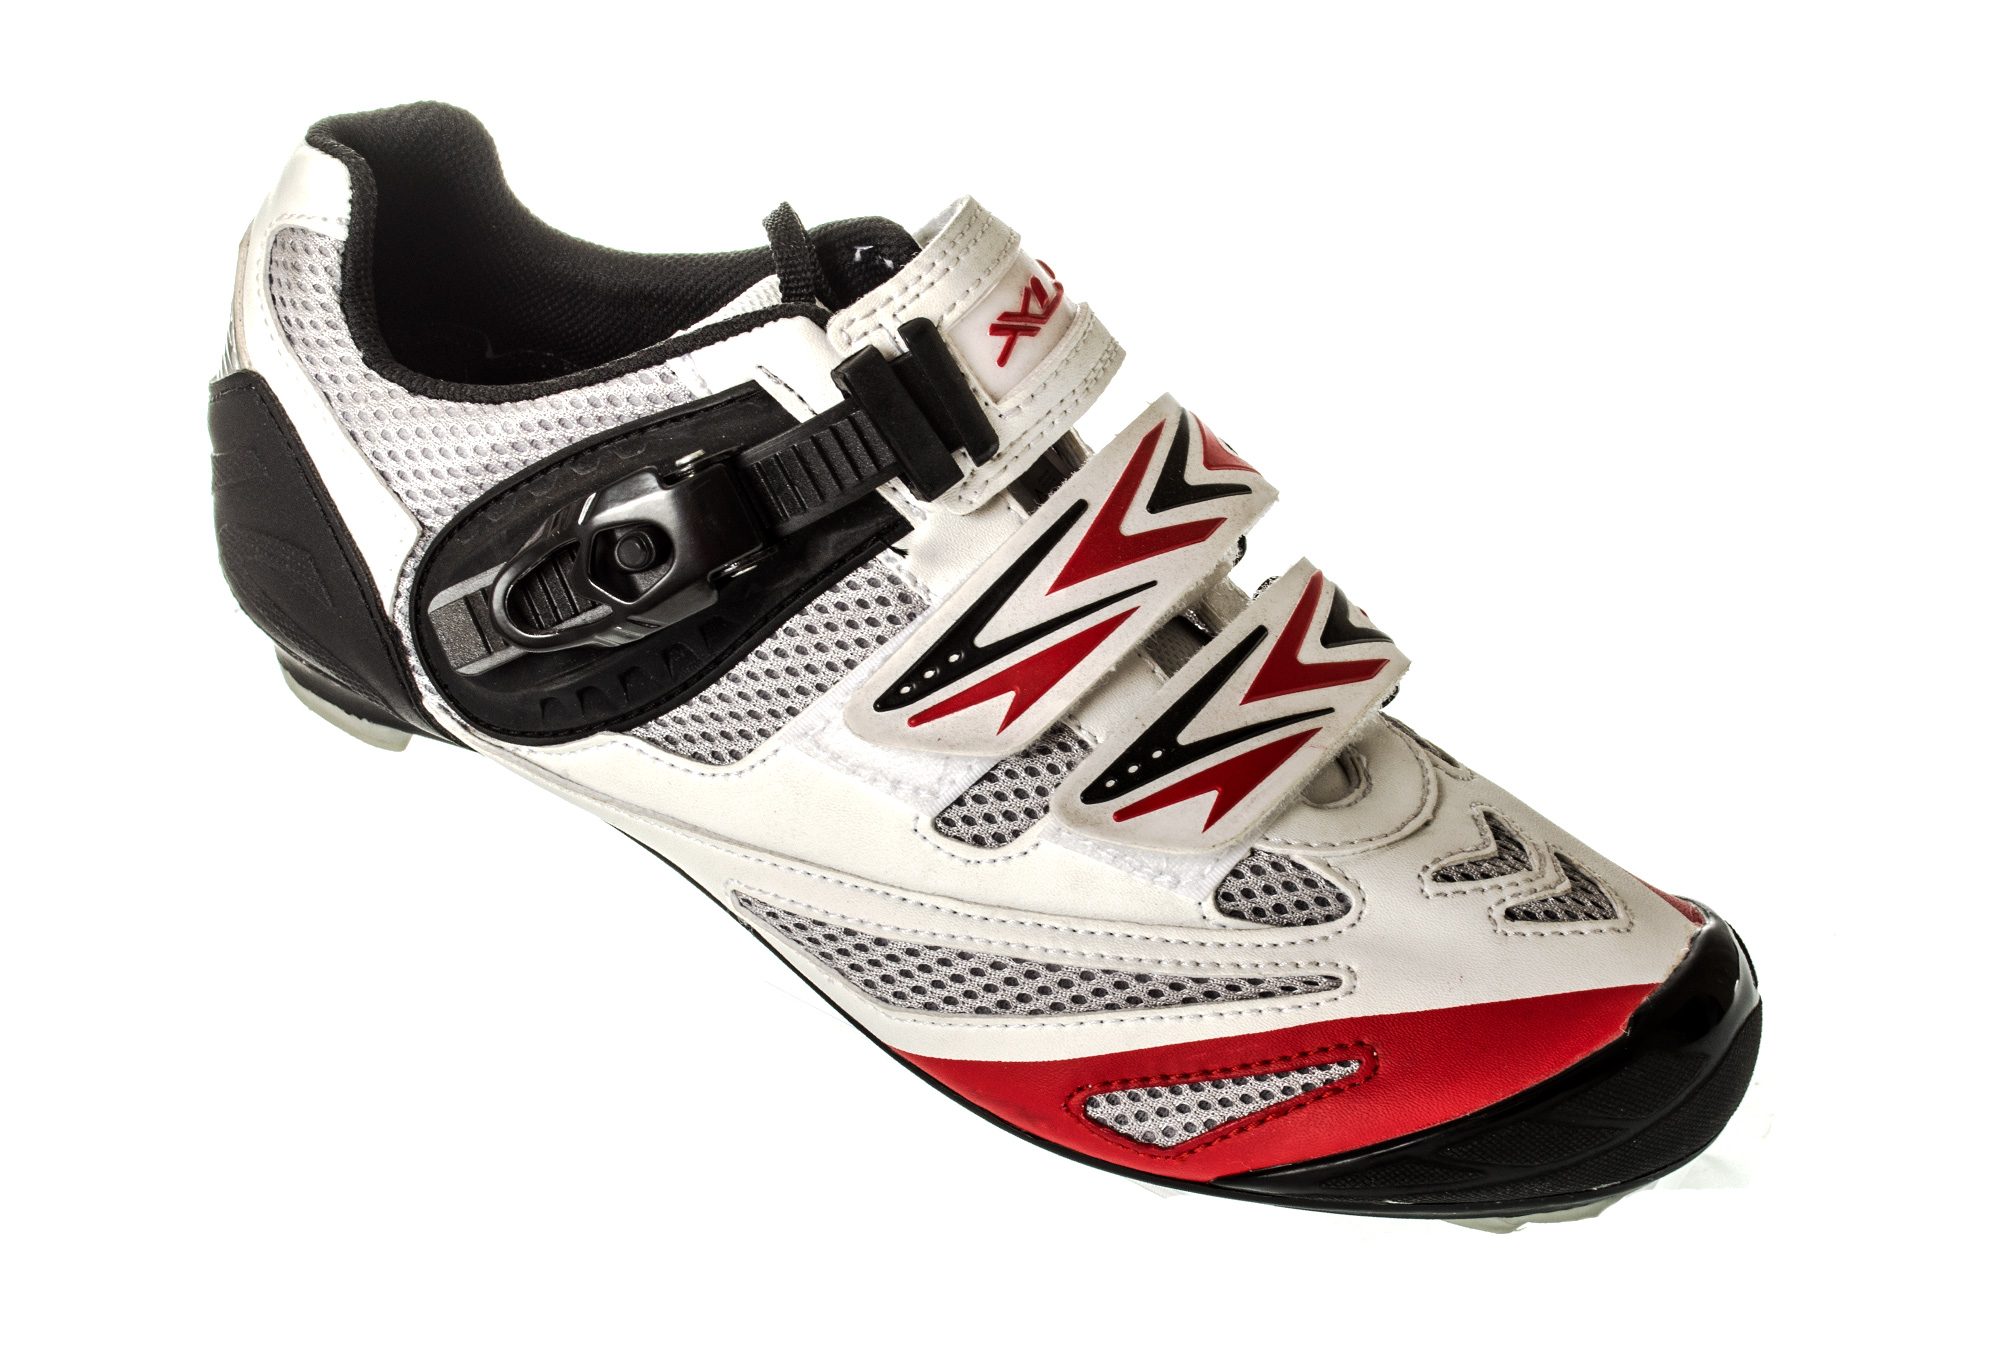 Crono Cycling Shoes Review